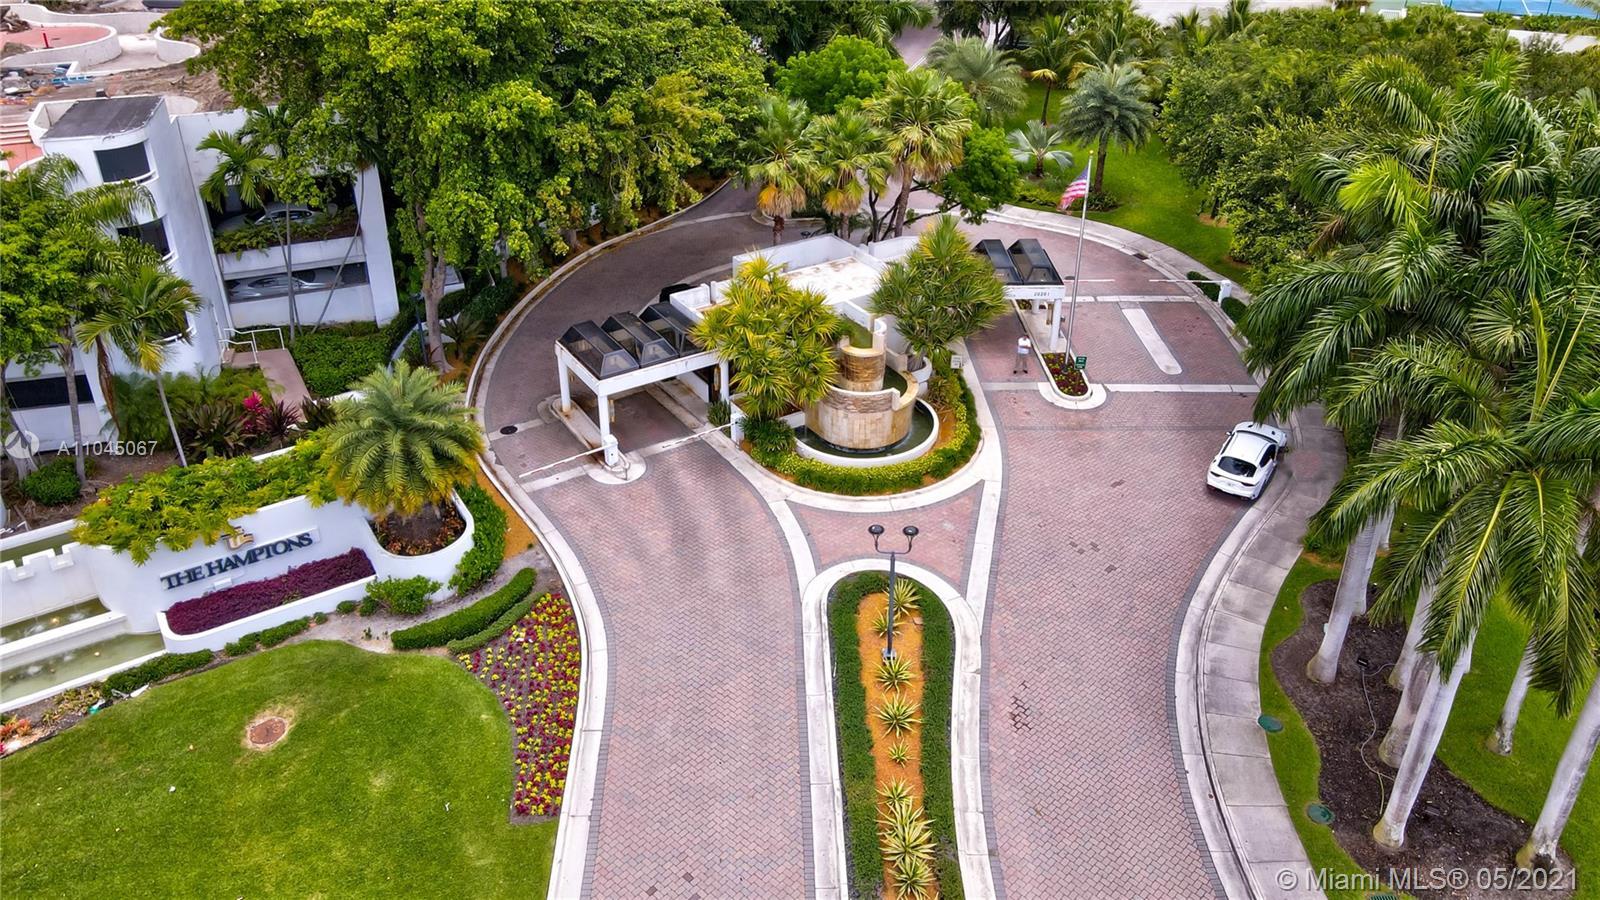 Photo of 20281 Country Club Dr #314, Aventura, Florida, 33180 - Country Club Dr, Aventura, FL